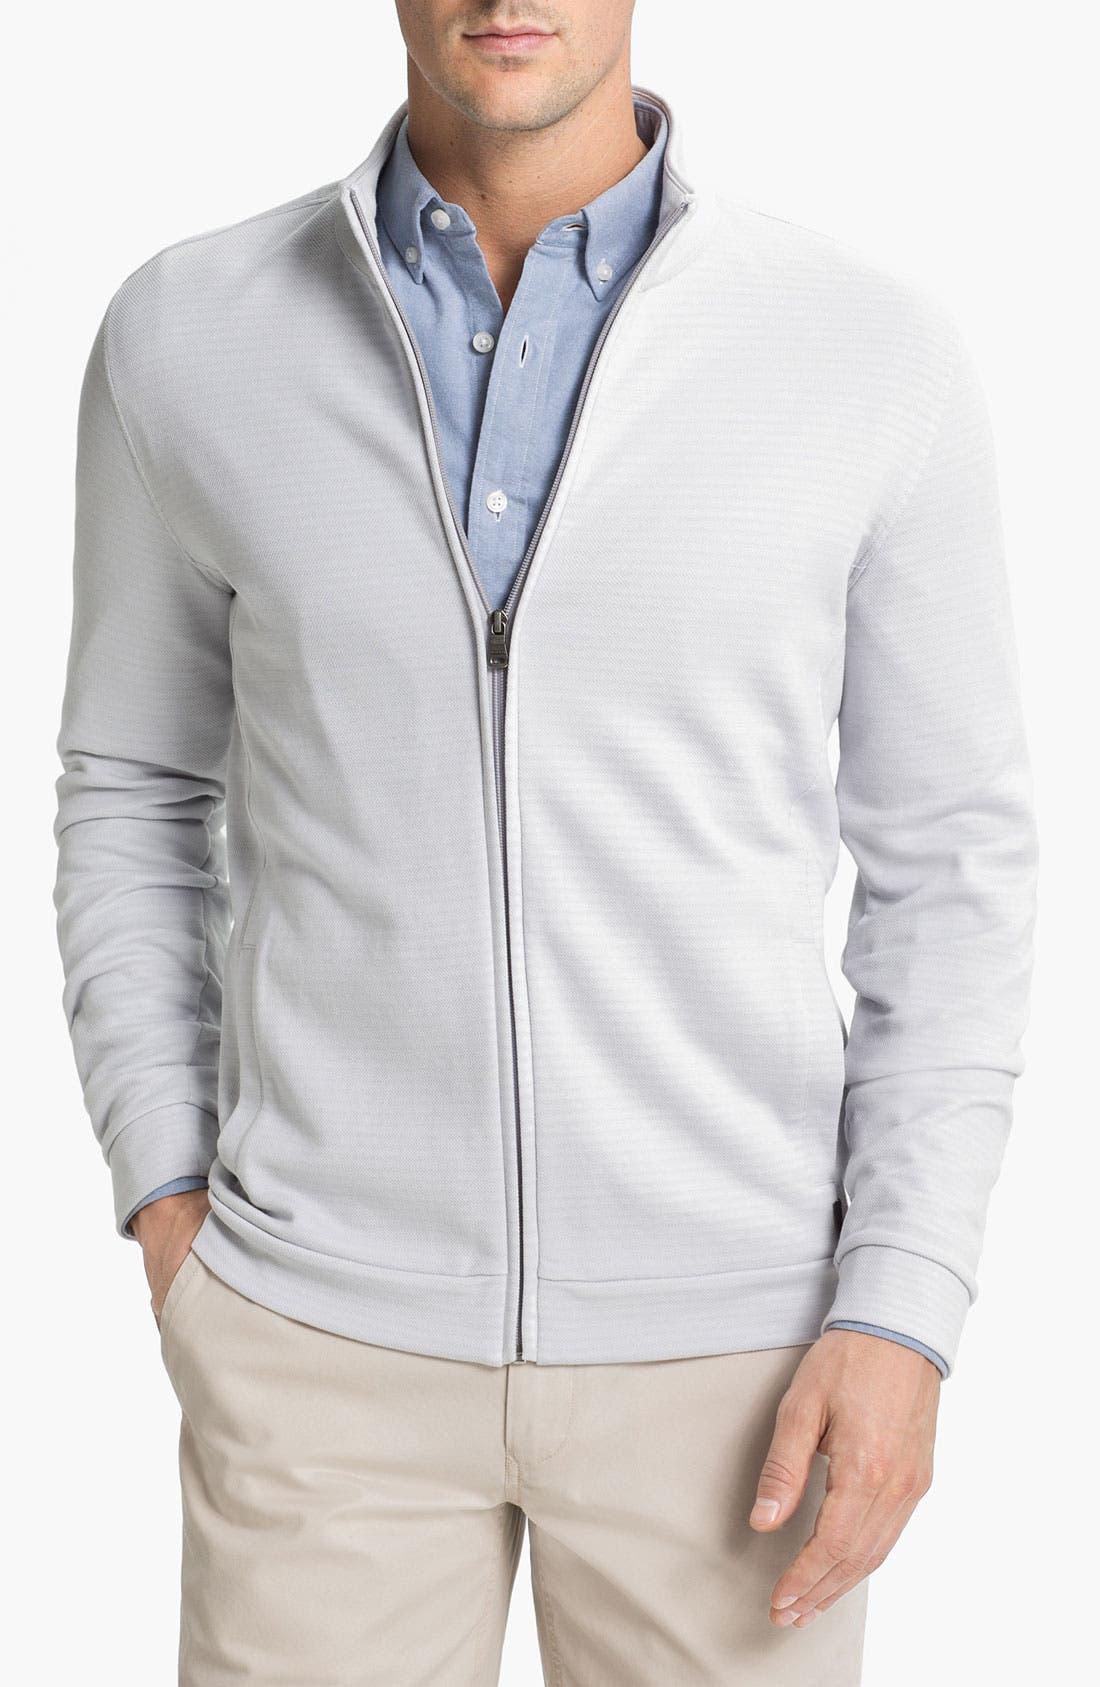 Main Image - BOSS Black 'Cannobio' Full Zip Knit Jacket